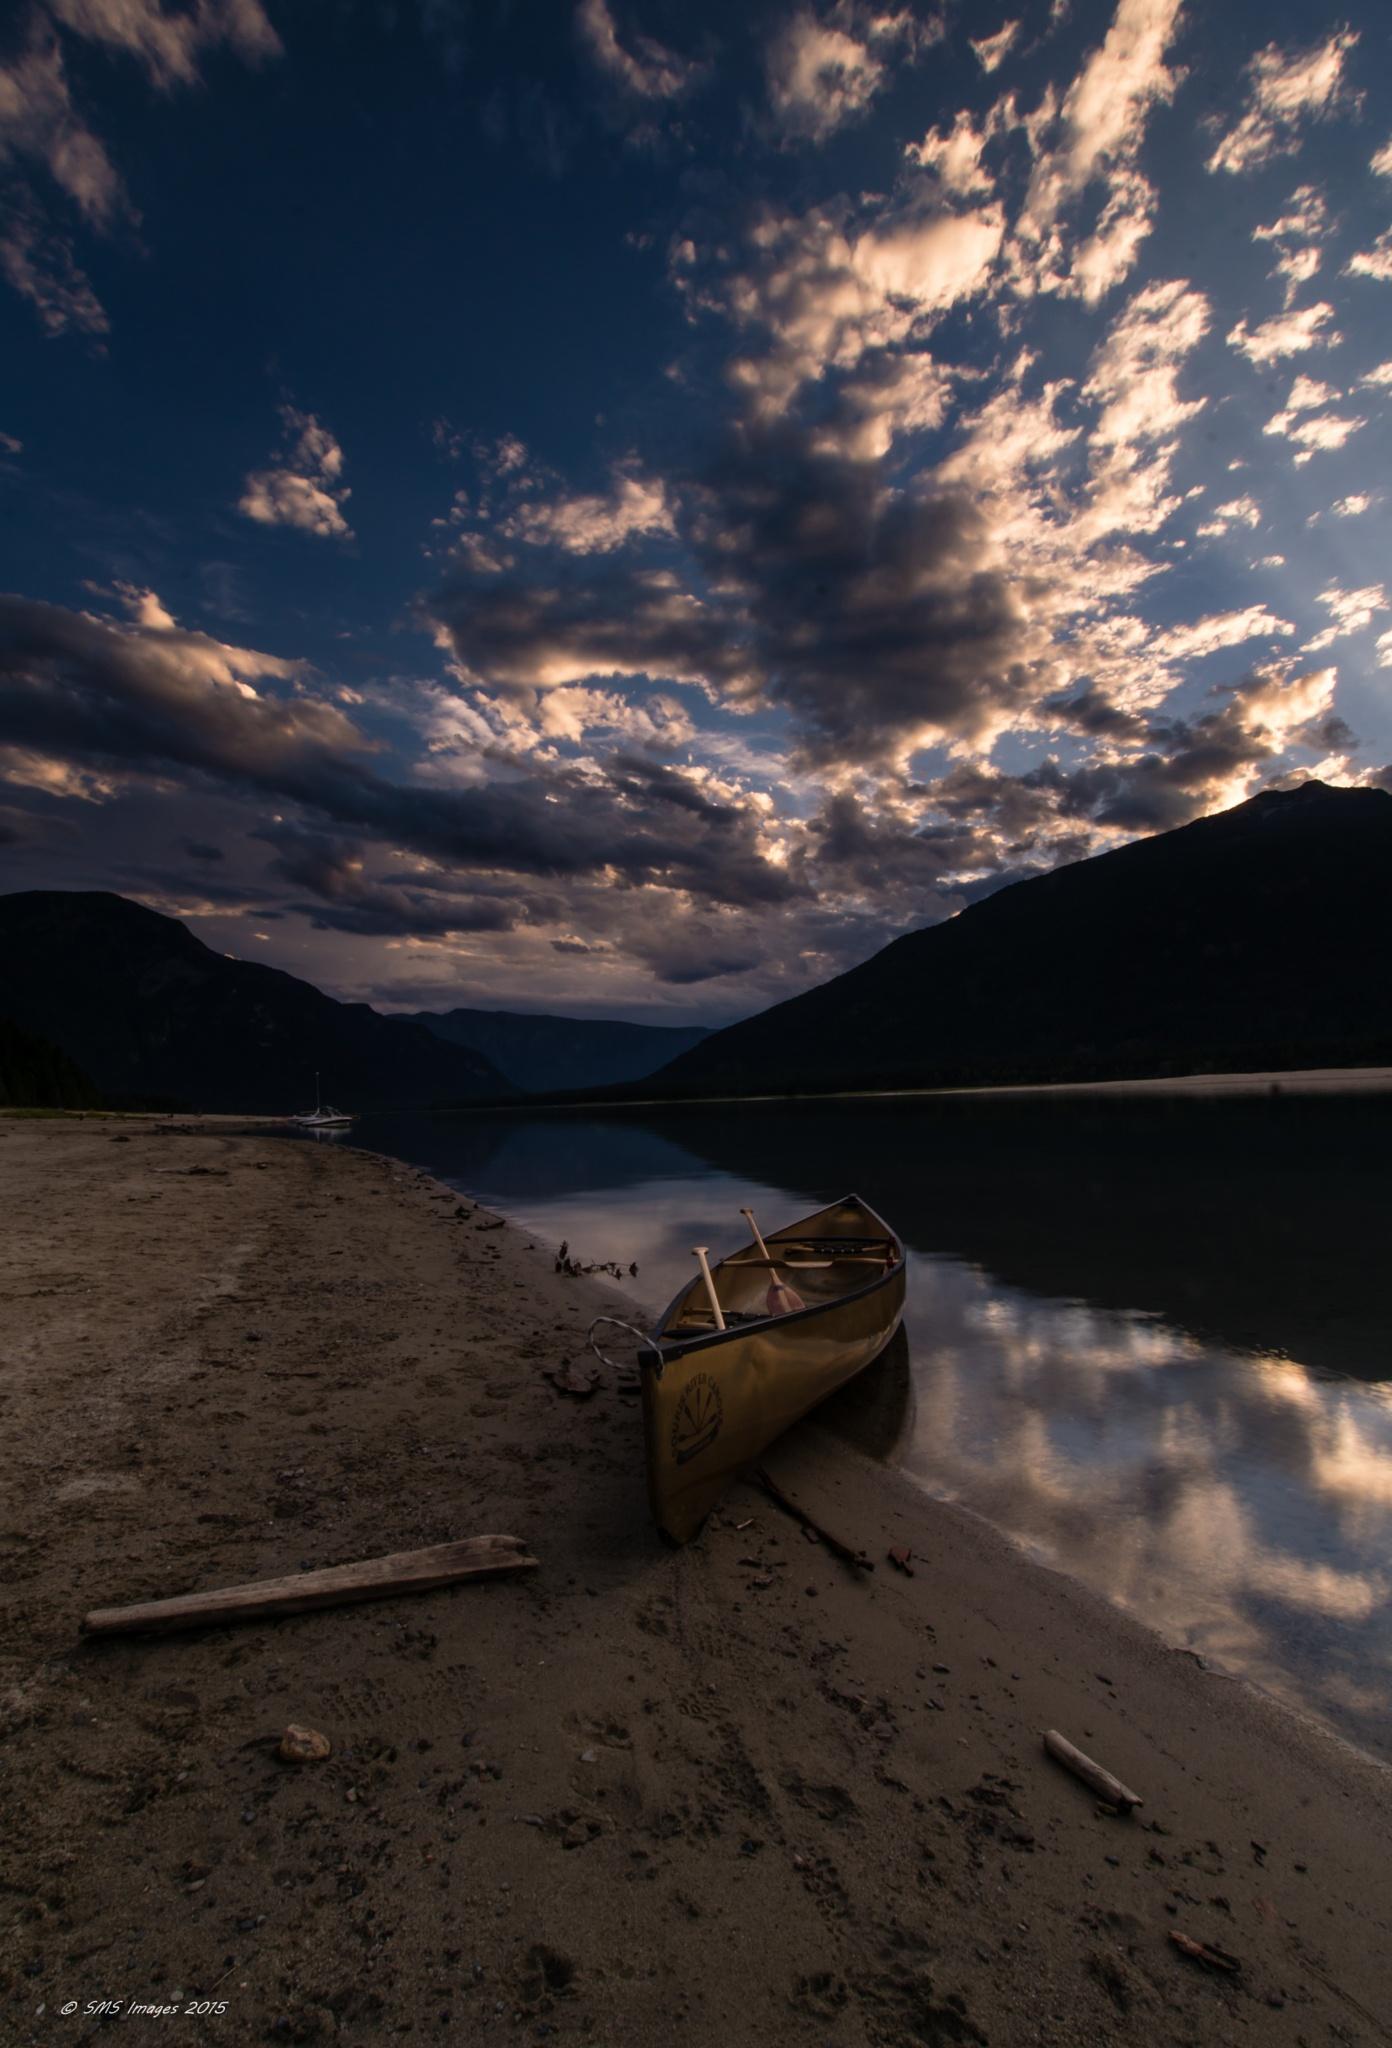 Big Sky, Clear Water by SteveMumert